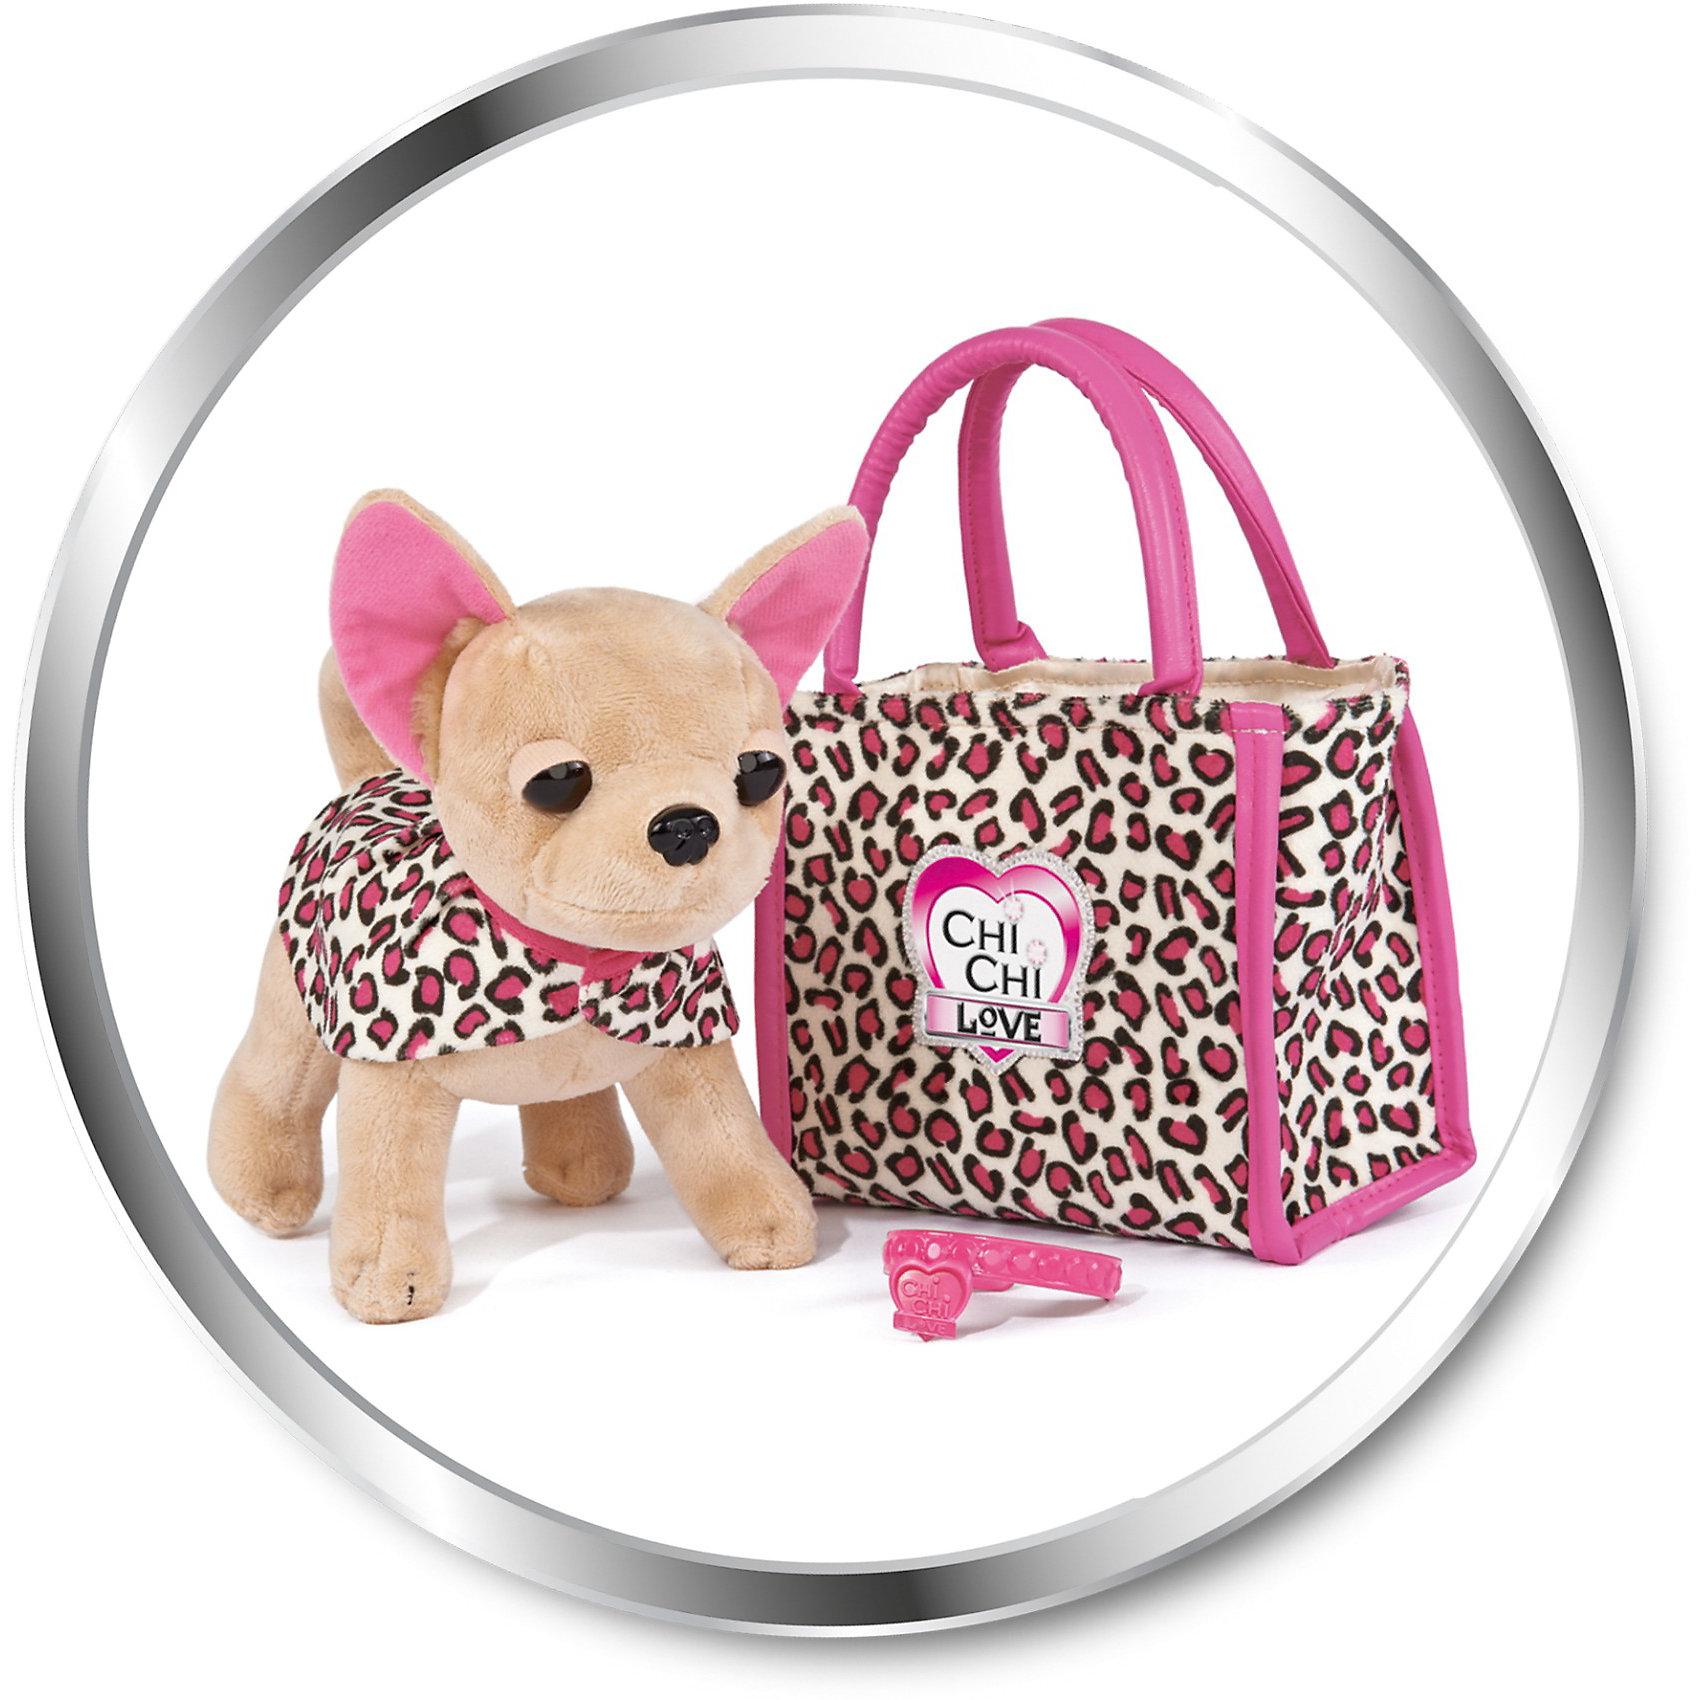 Simba Плюшевая собачка Чихуахуа Лео с сумочкой и ошейником, 20 см, Simba